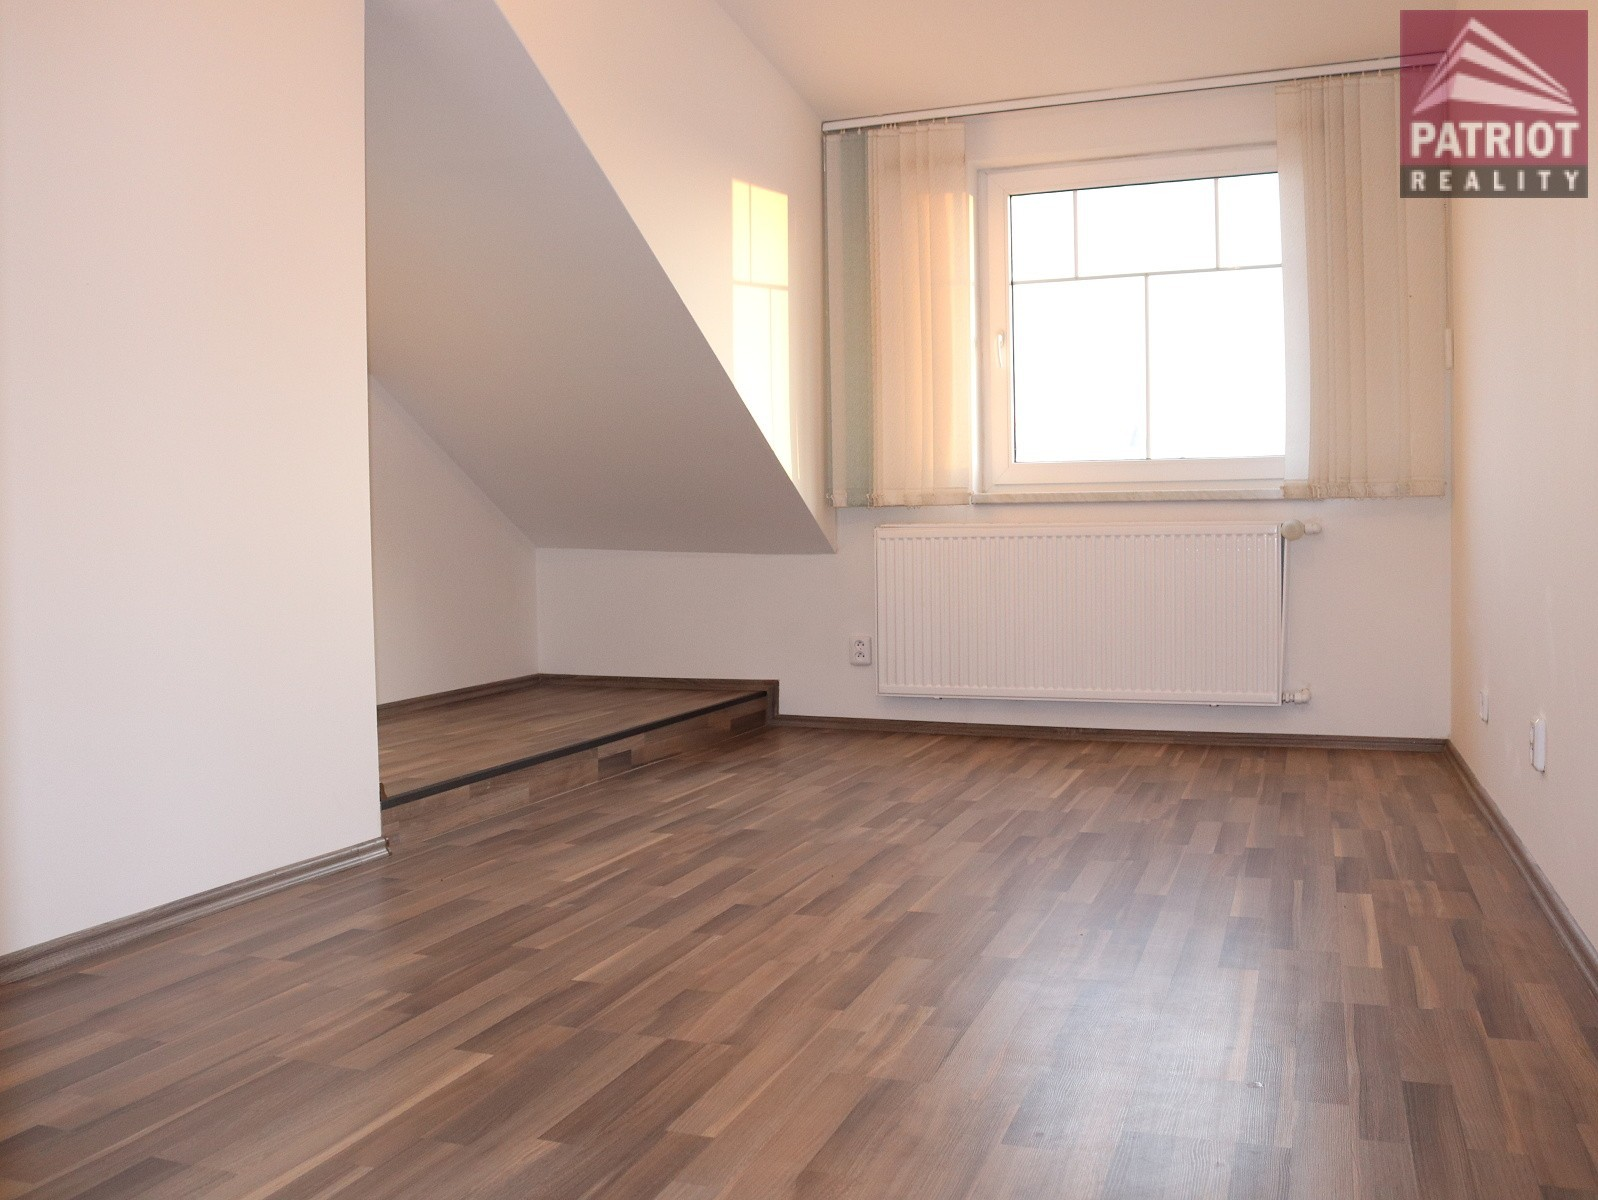 Mezonetový byt 5+1 Rejskova v Olomouci   PRODÁNO - 9